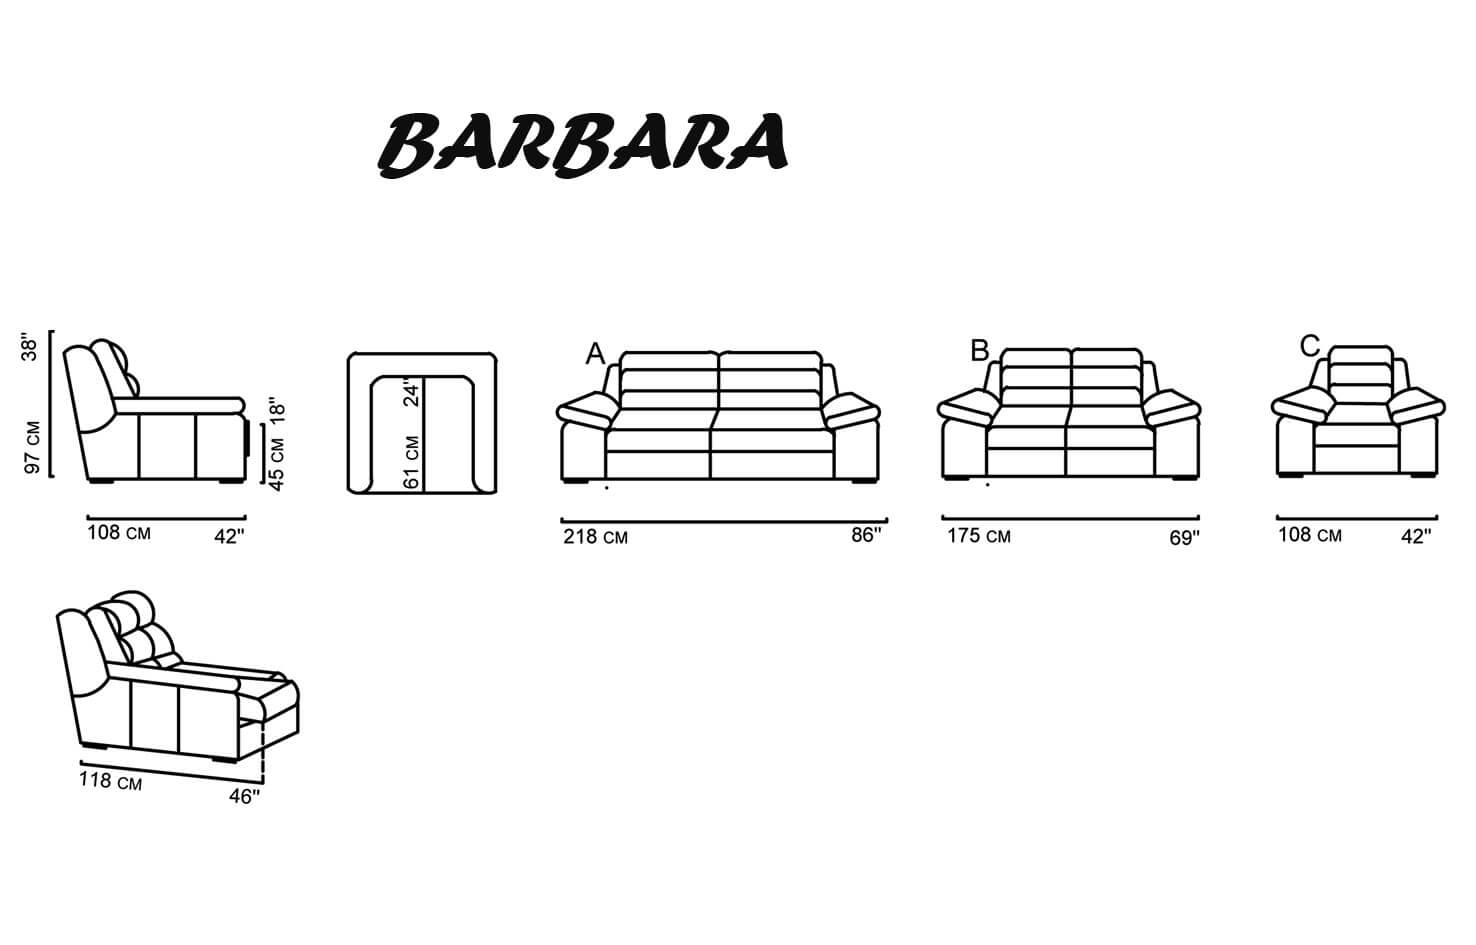 barbara sofa giotto living sofa relax sofa ange sofa sofabed